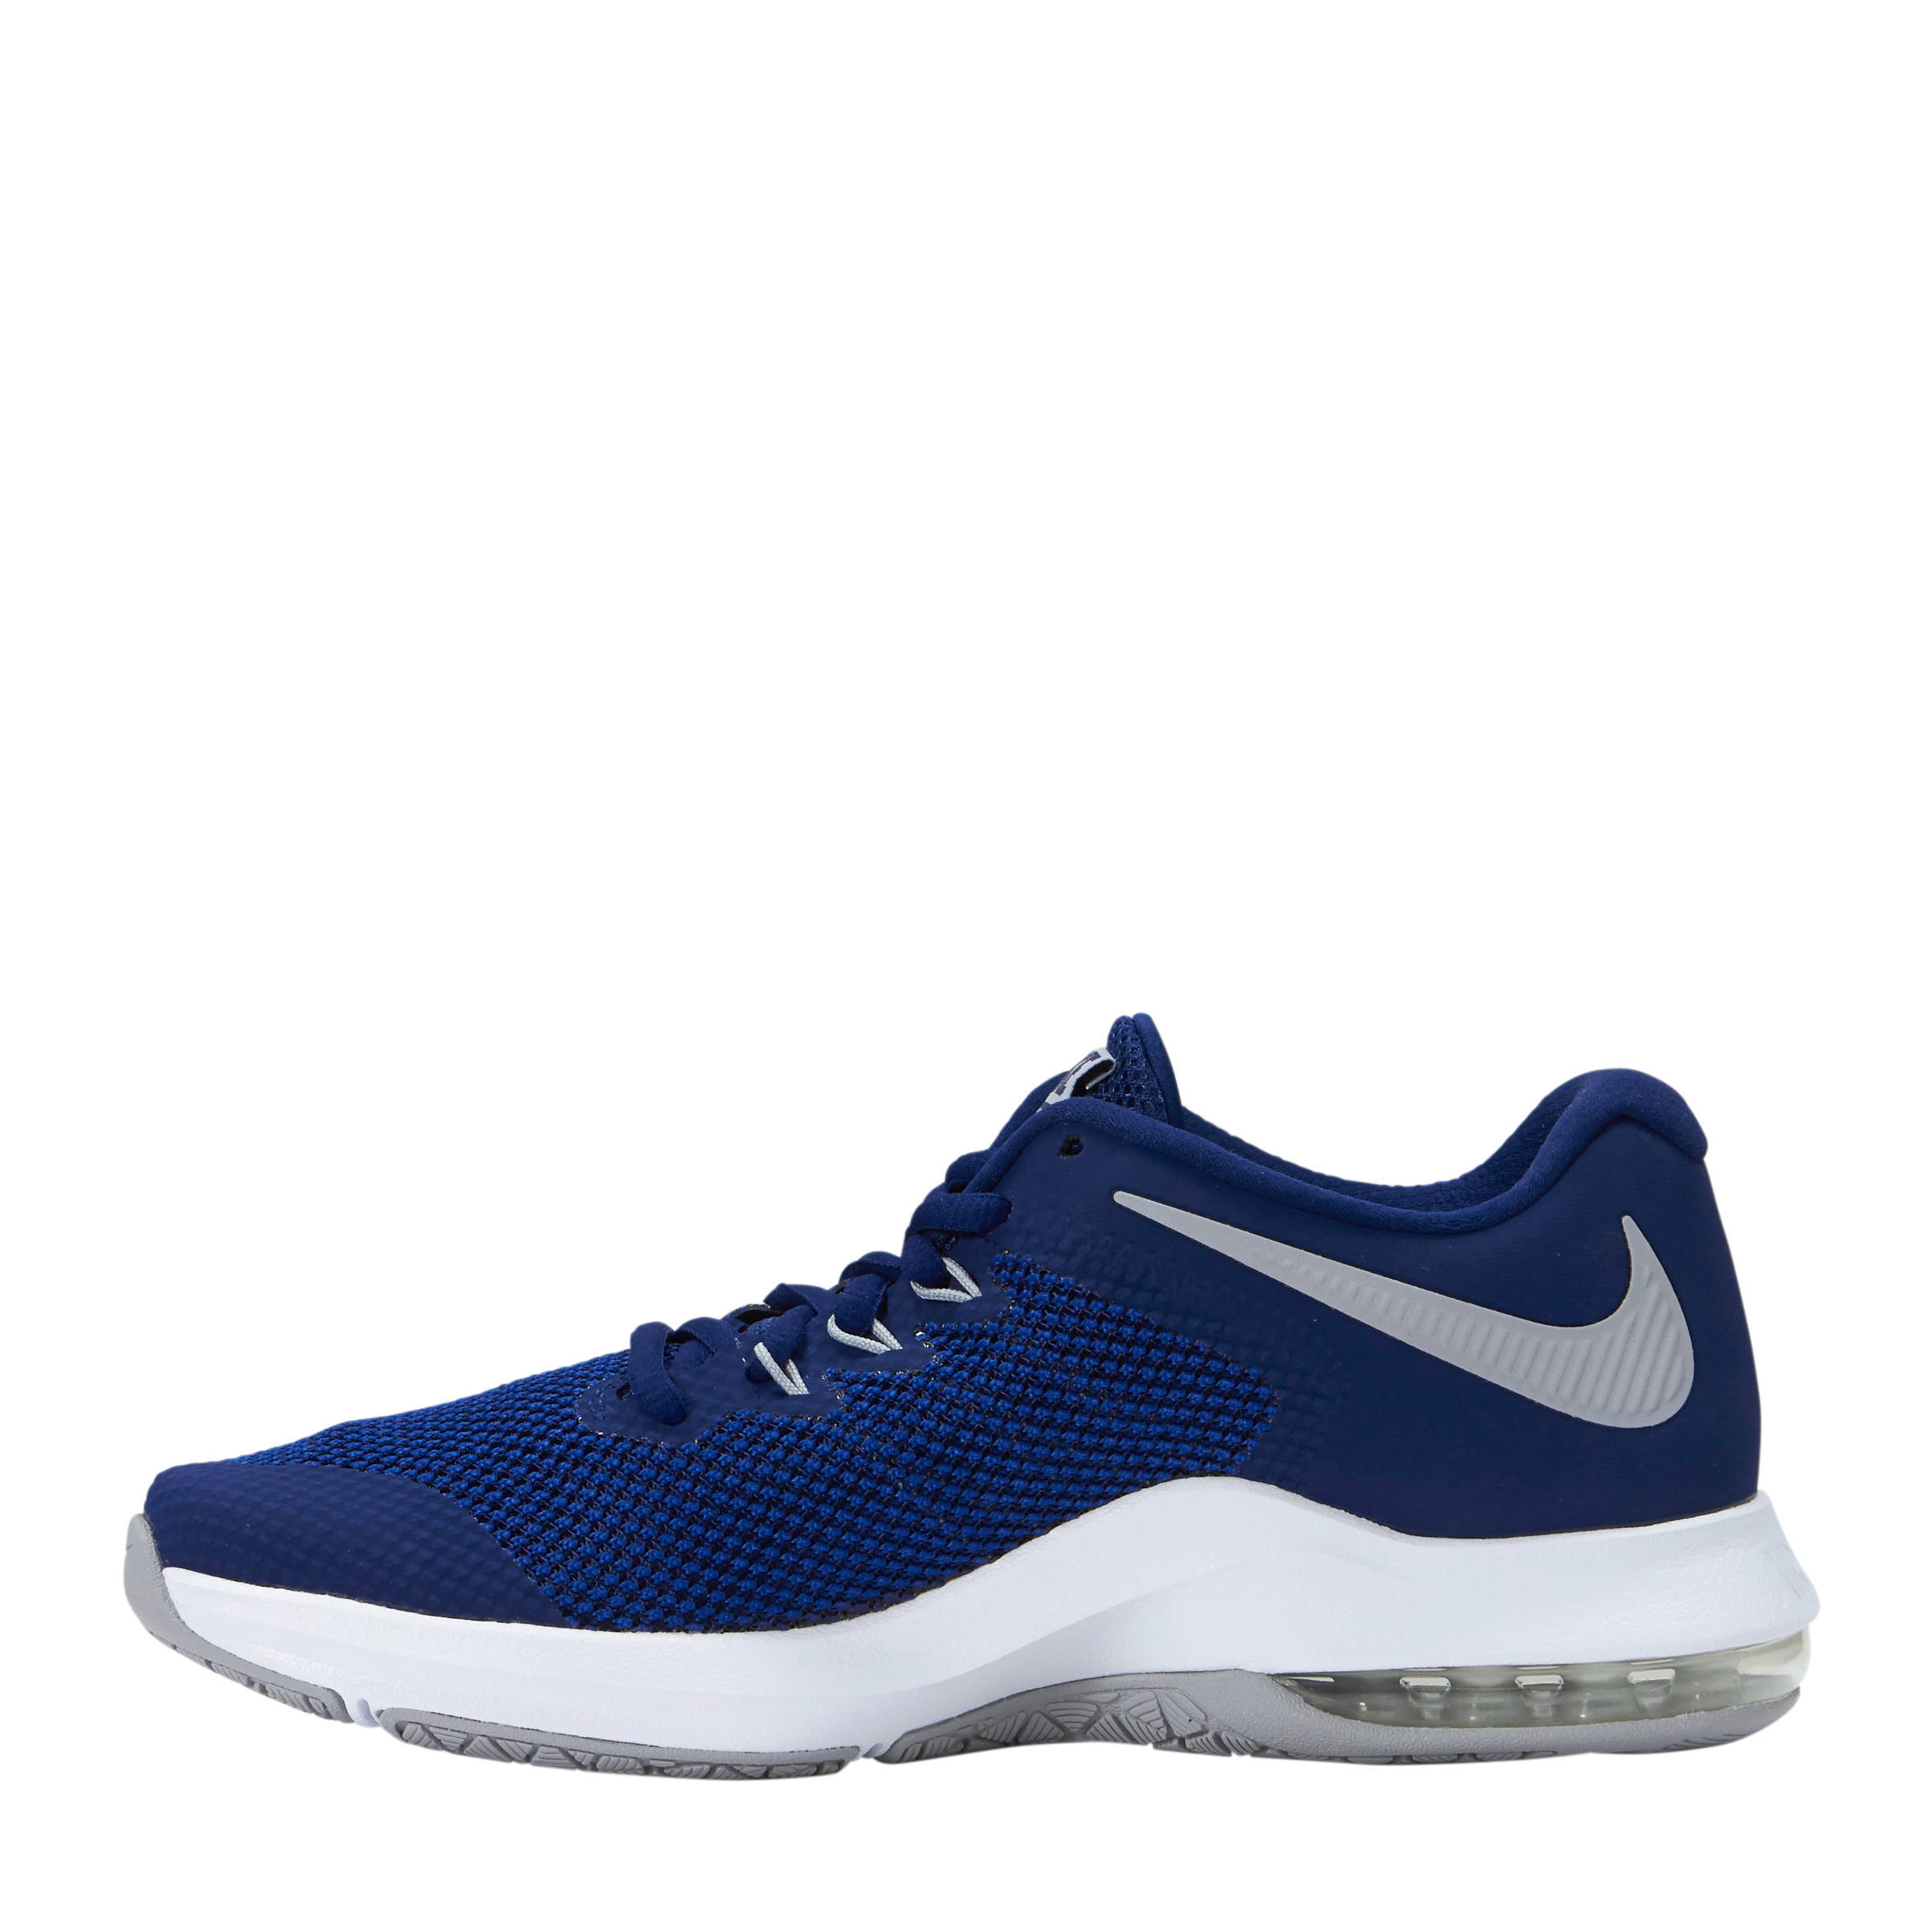 Nike Air Max Alpha Trainer sportschoenen | wehkamp